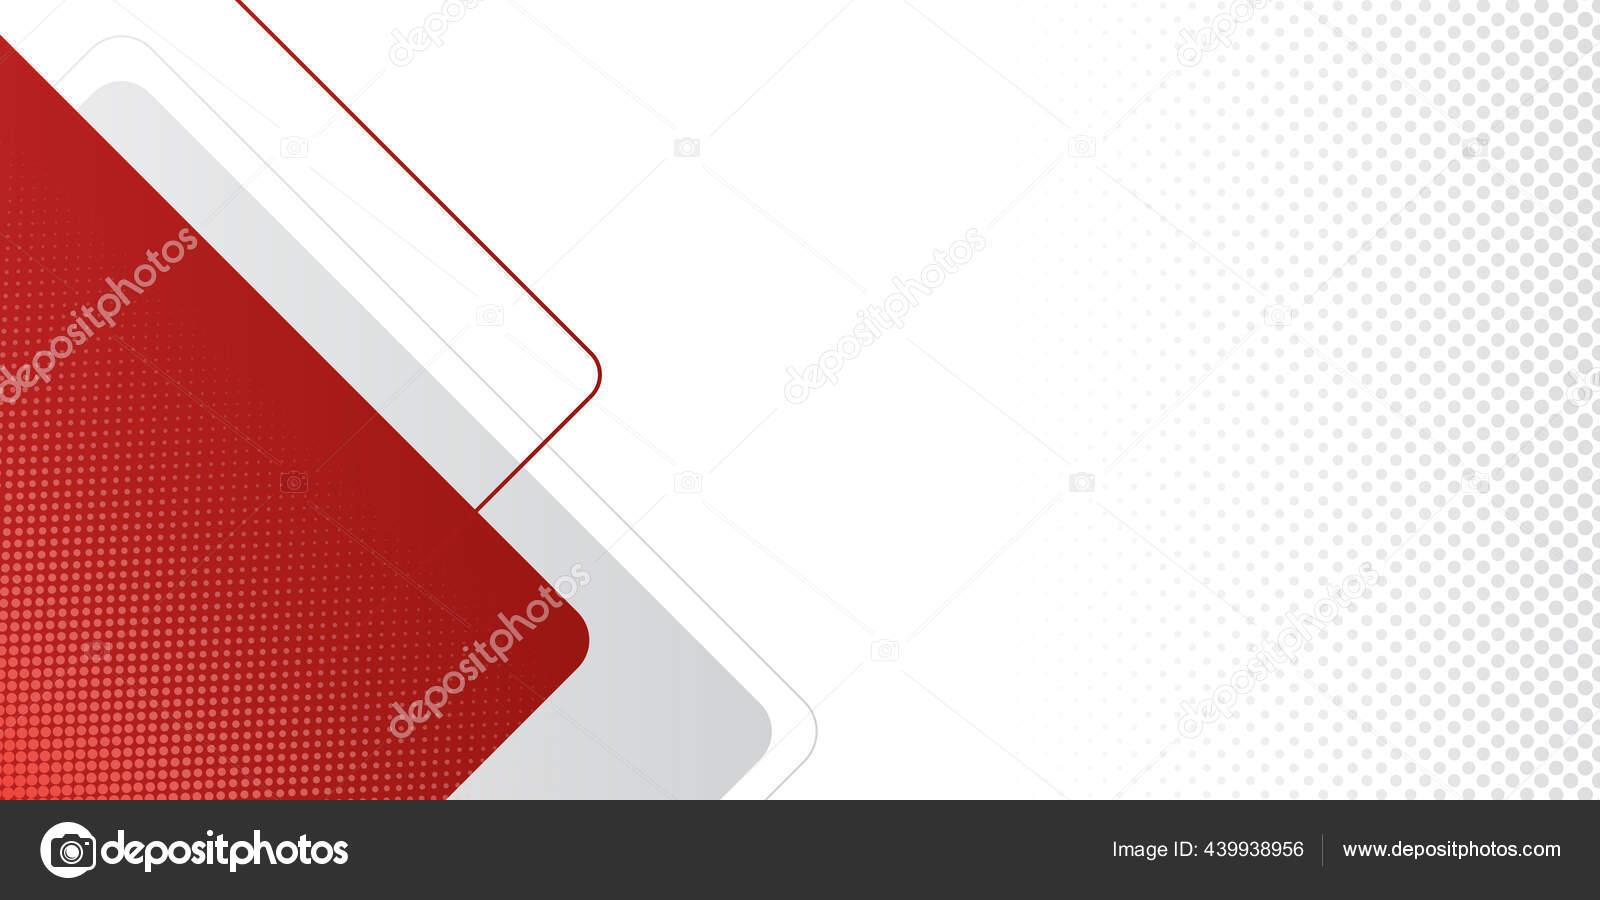 Latar Belakang Merah Dan Putih Abstrak Vector Illustration Desain Abstrak —  Stok Vektor © Salmanalfa #439938956